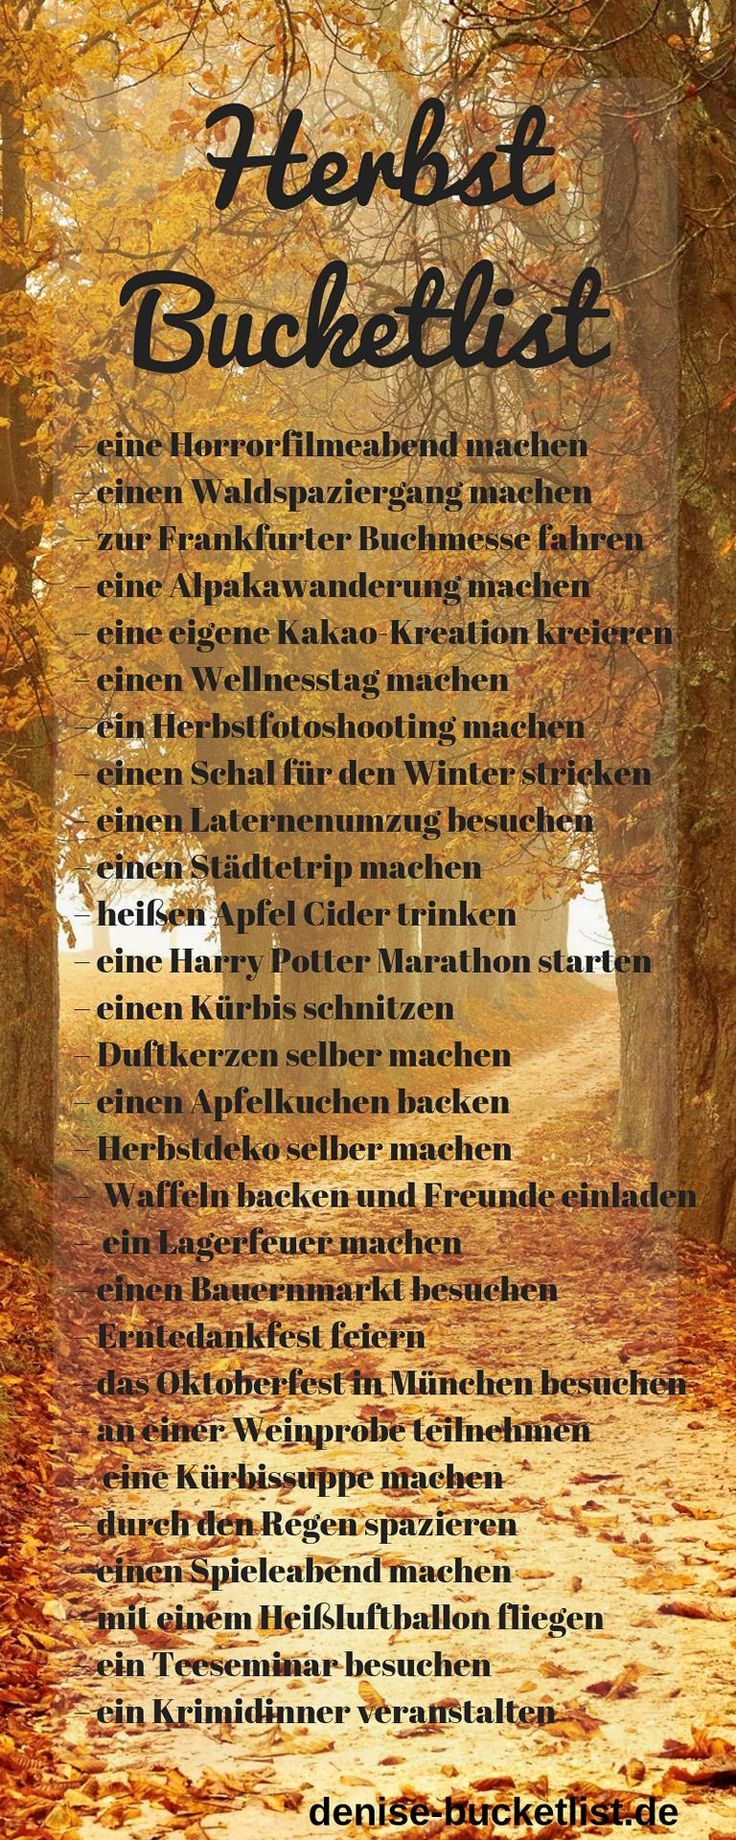 Herbstbucketlist Ideen: Ausflüge & Tipps für den perfekten Herbst